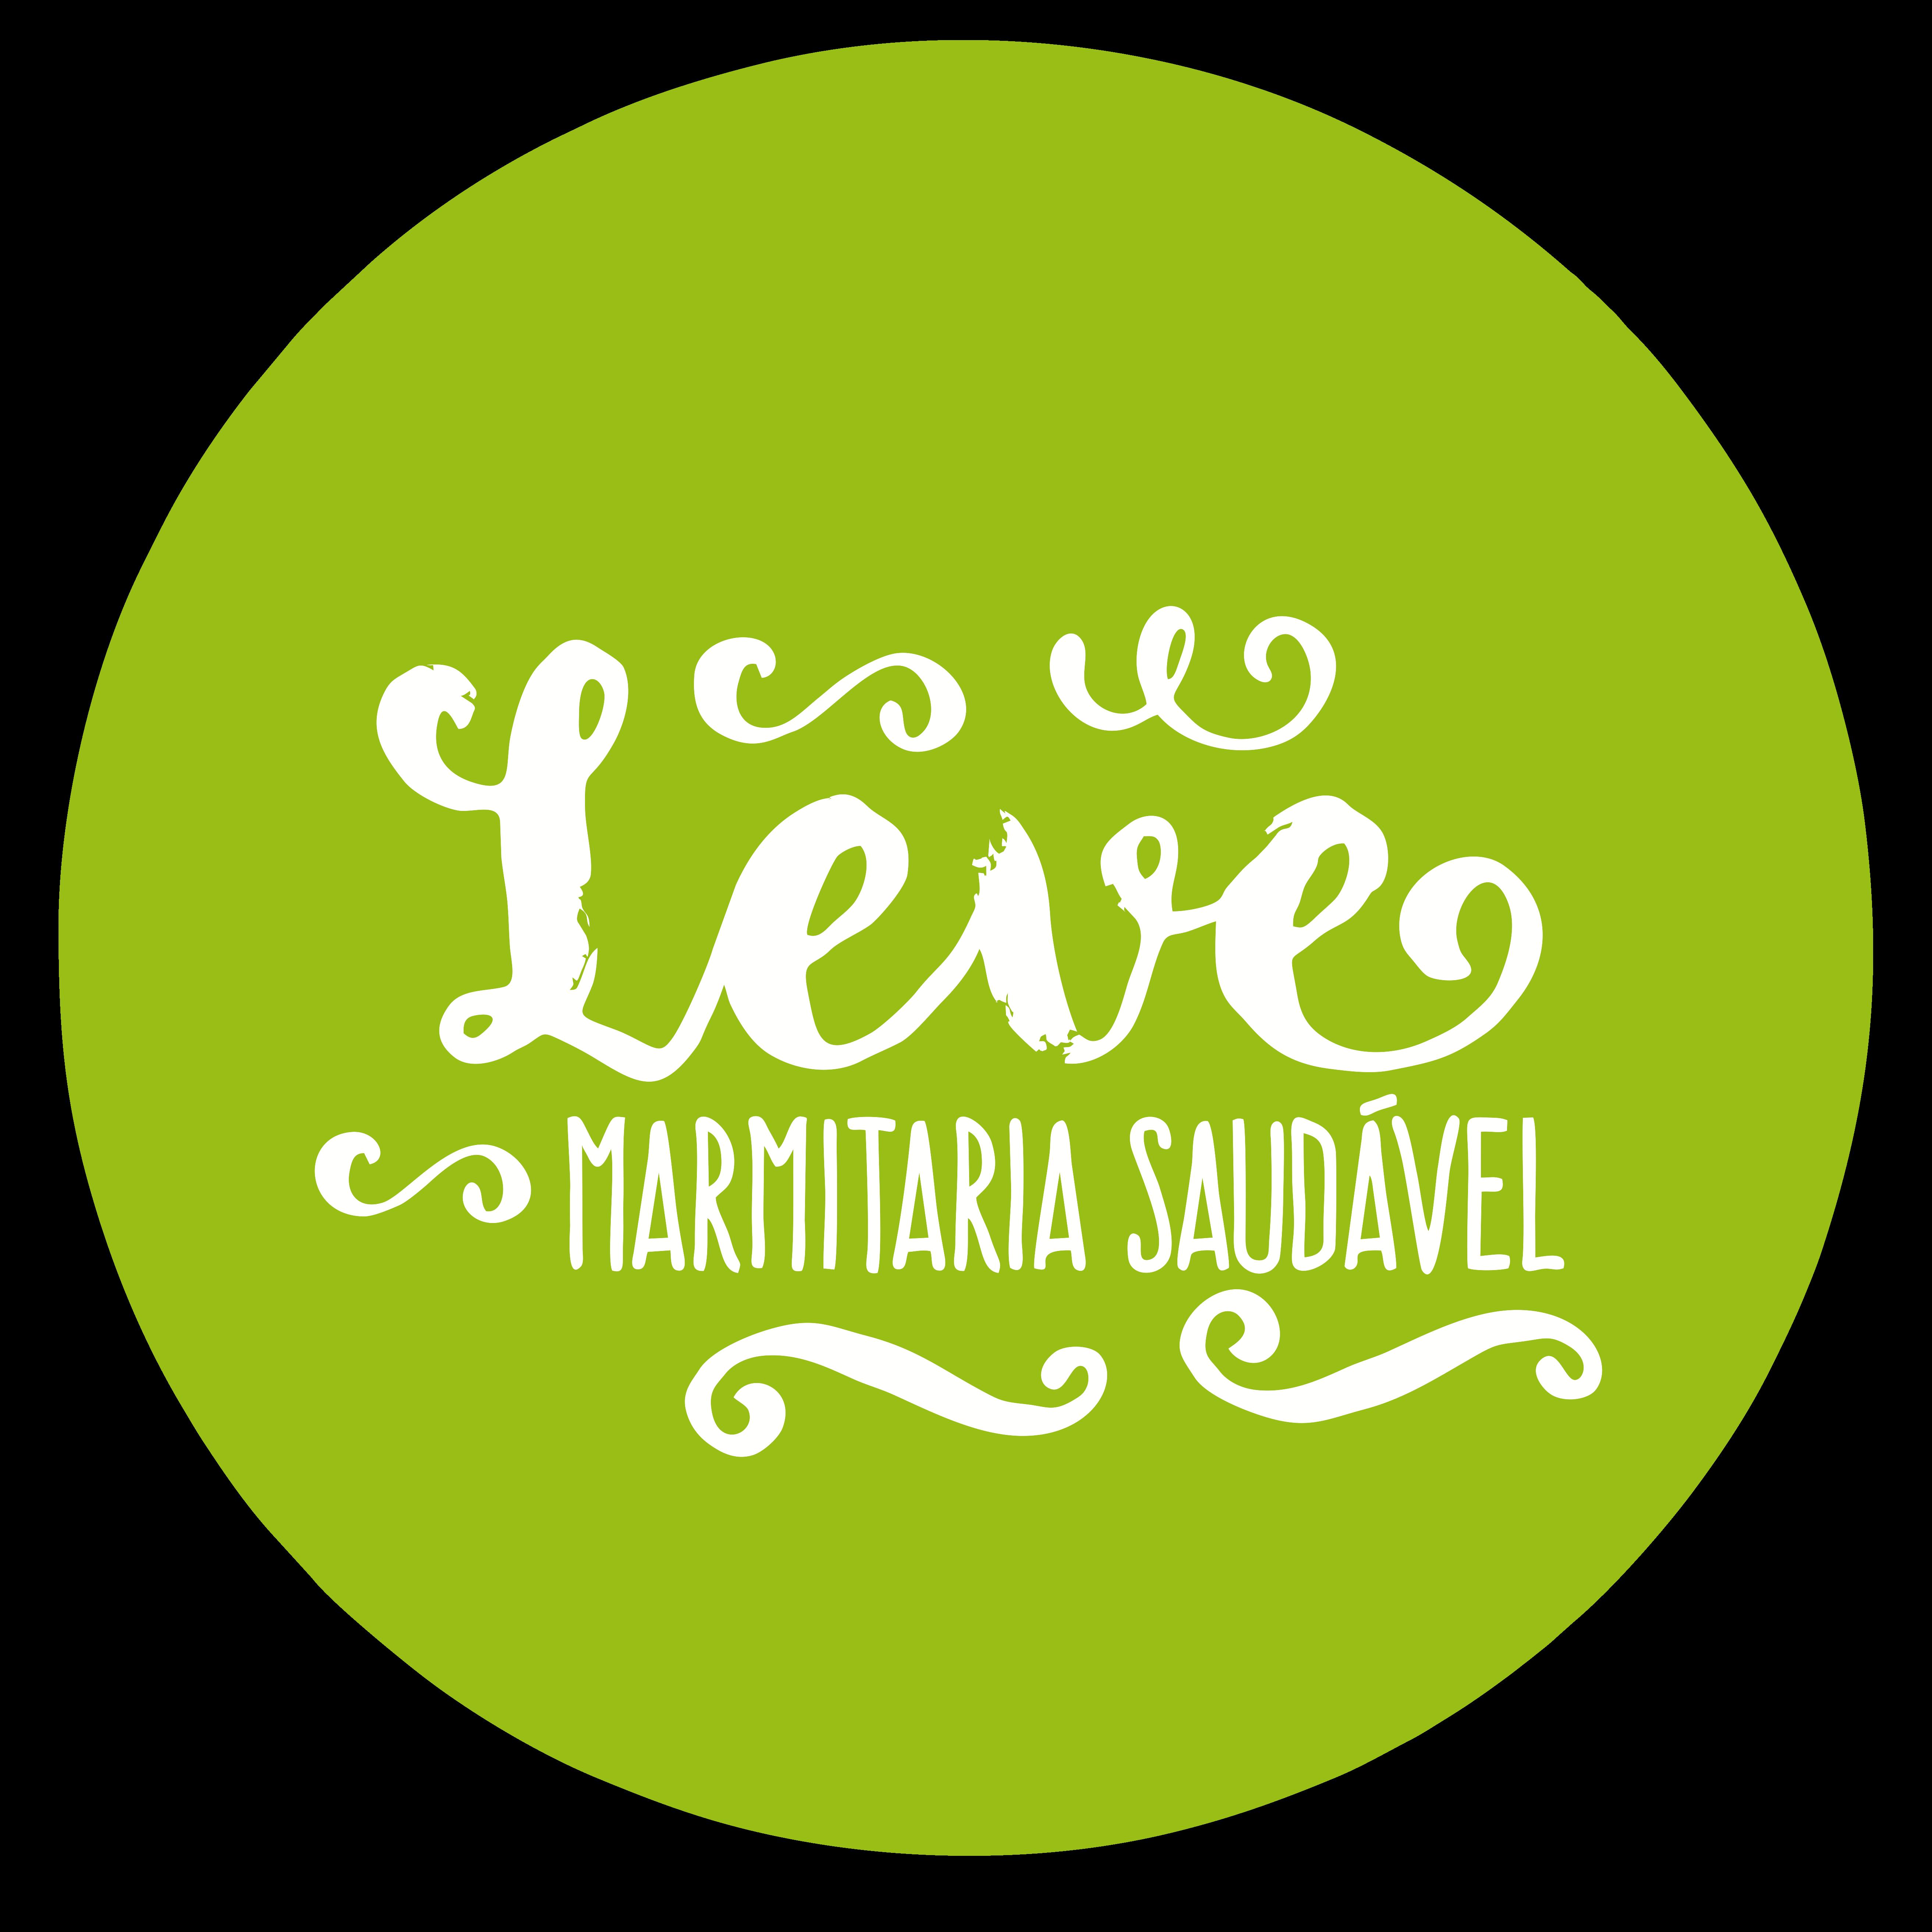 Leve Marmitaria Saudável